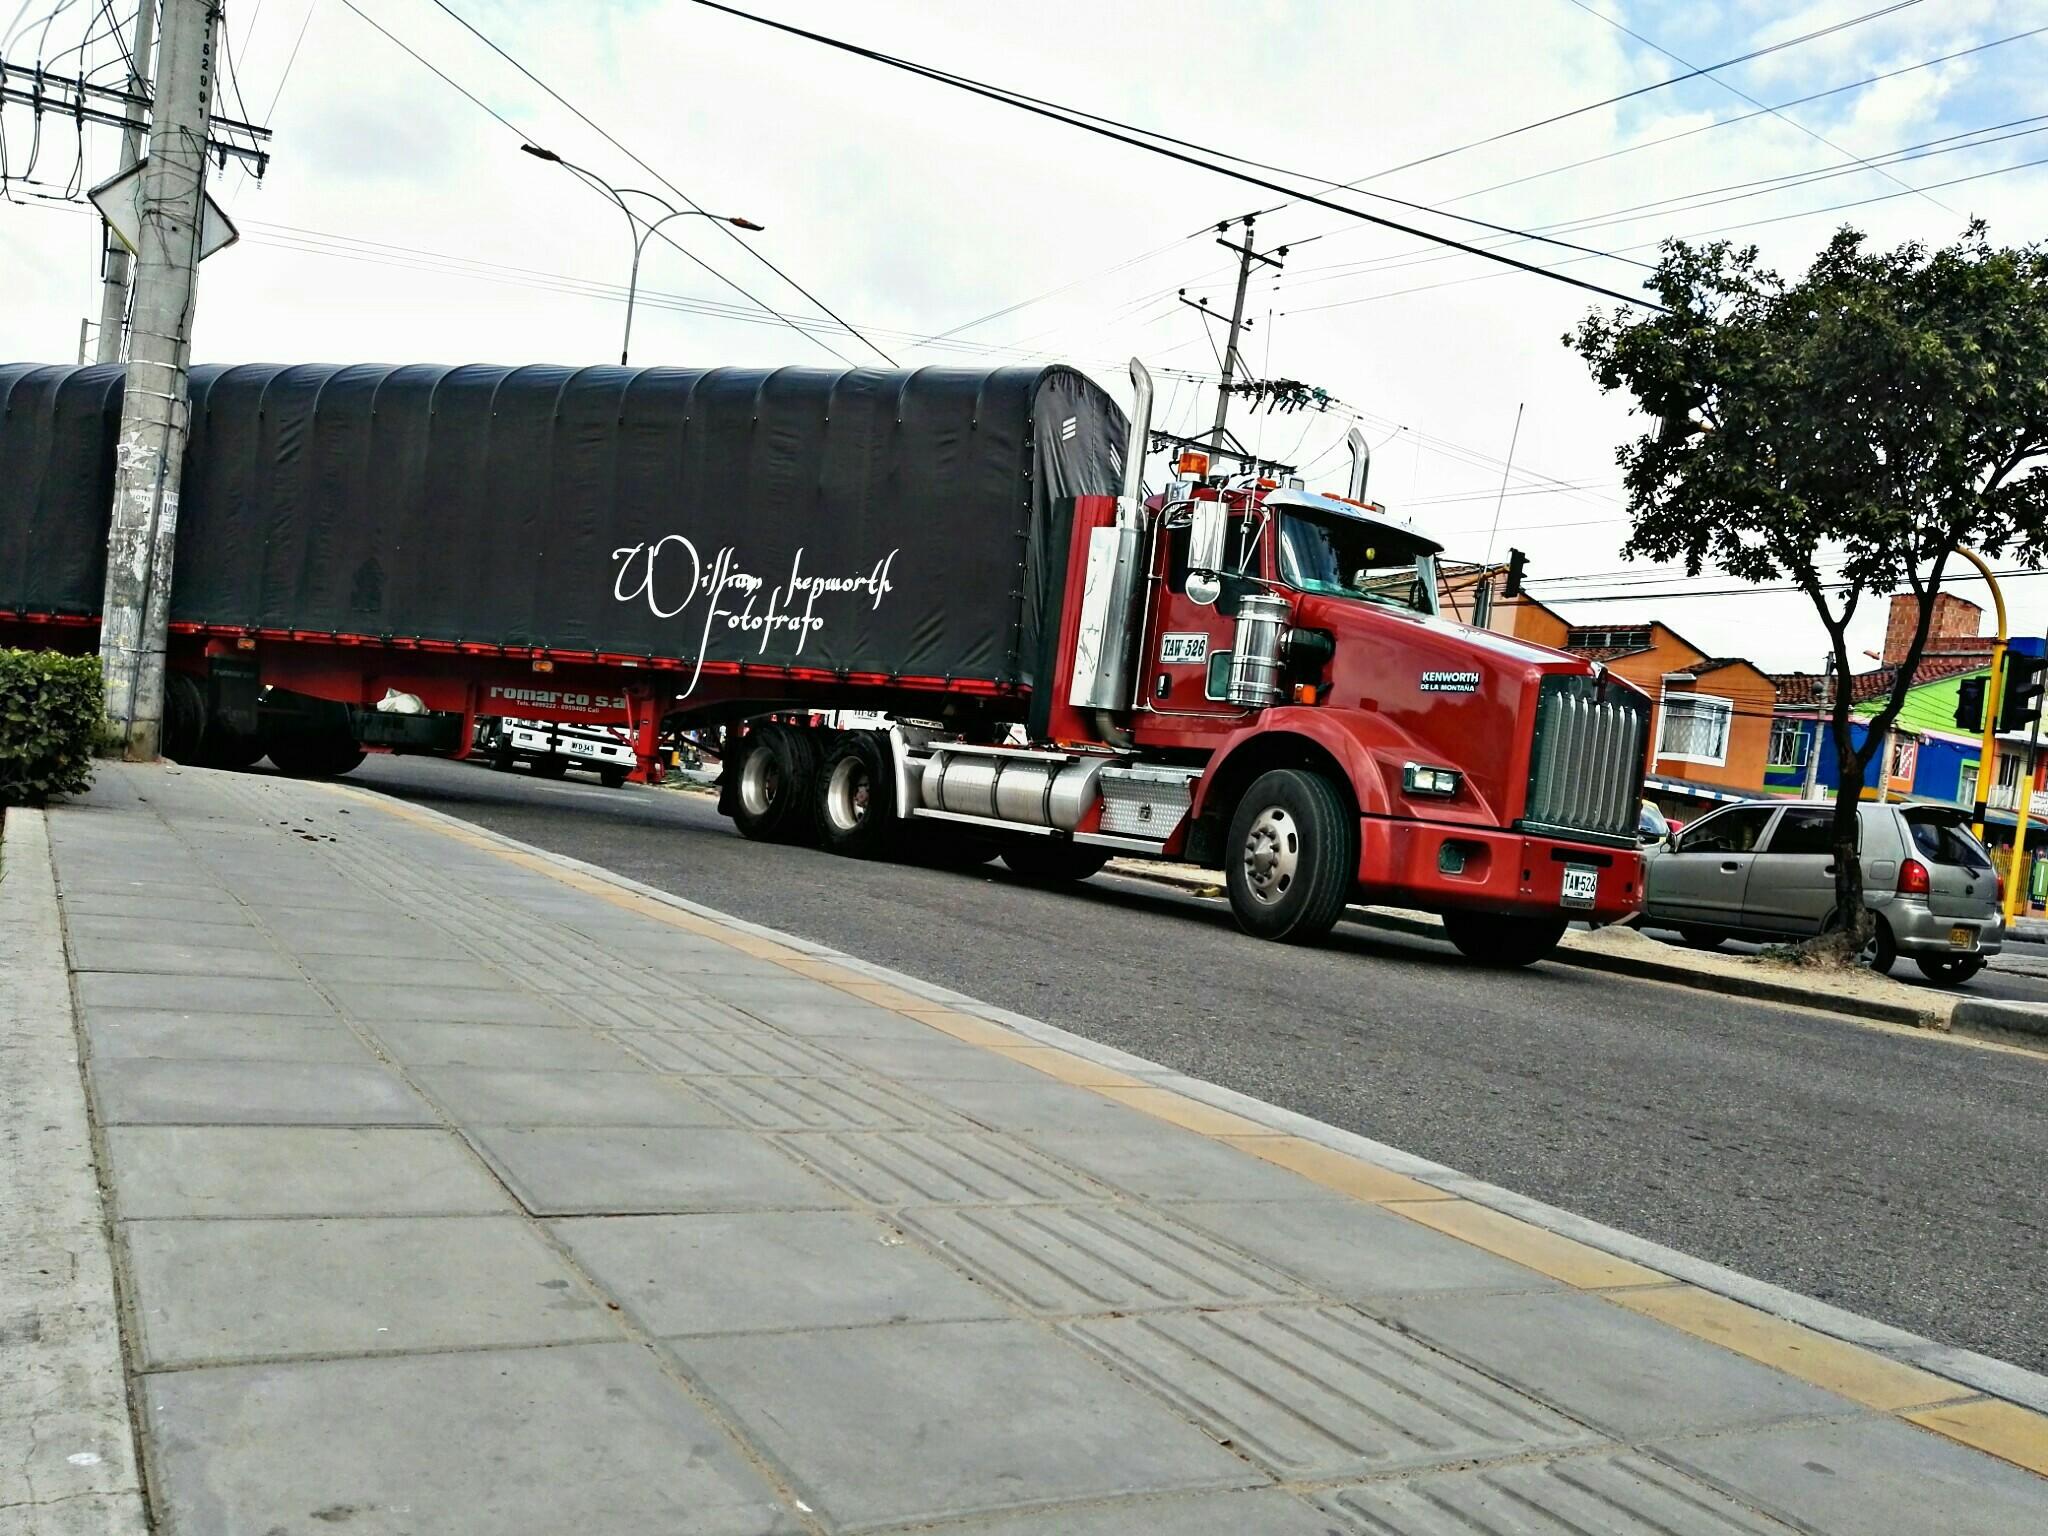 Camiones-Sencillo-Truck-Photo-32